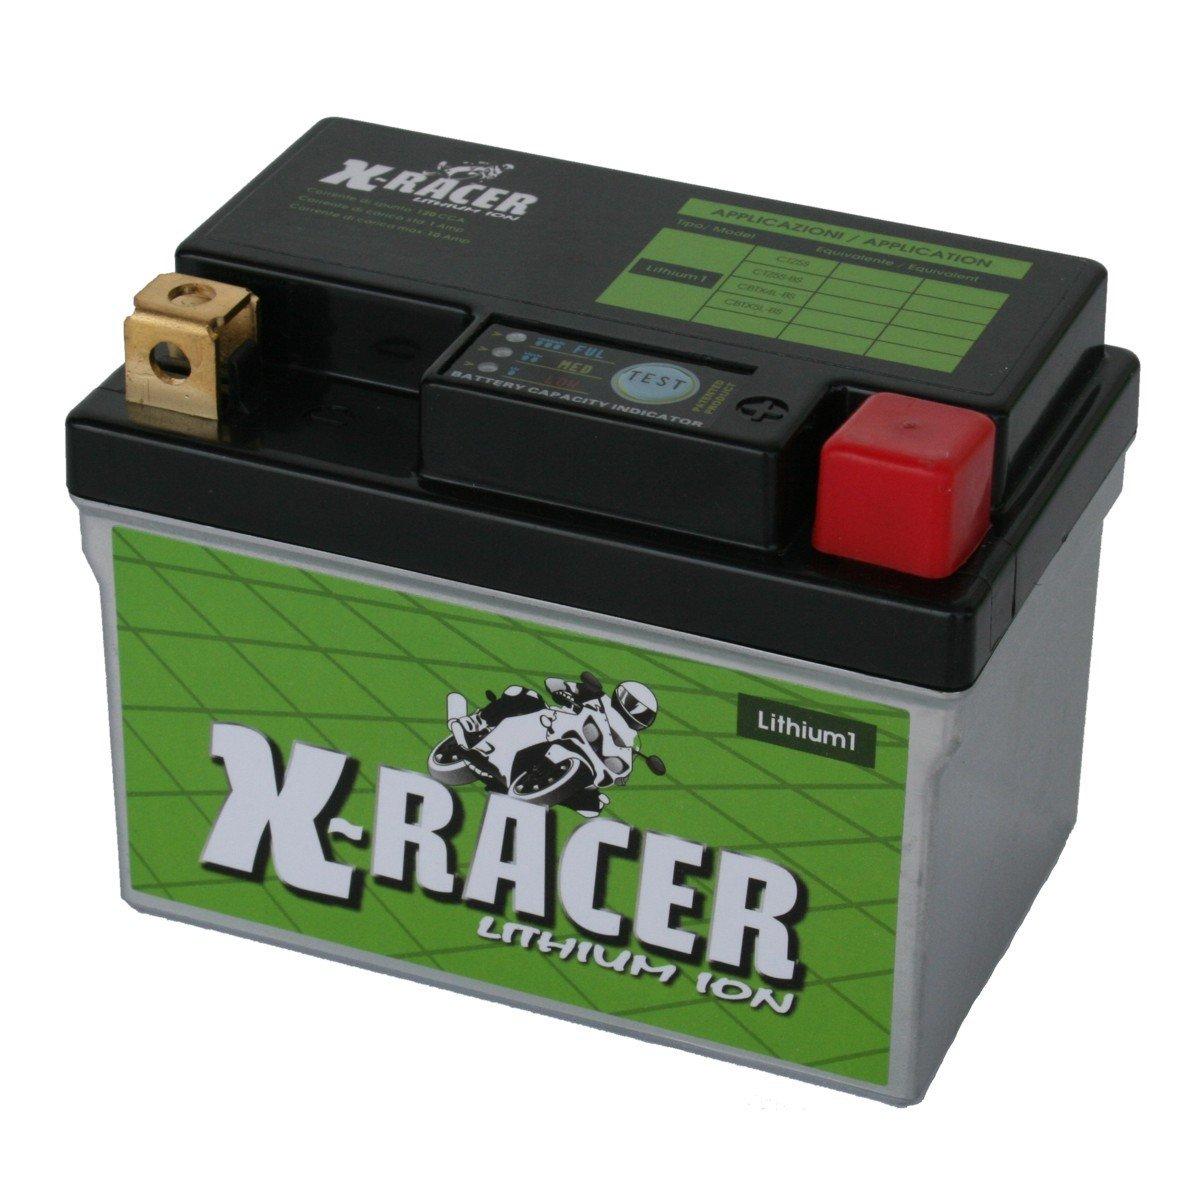 X-RACER Lithium1